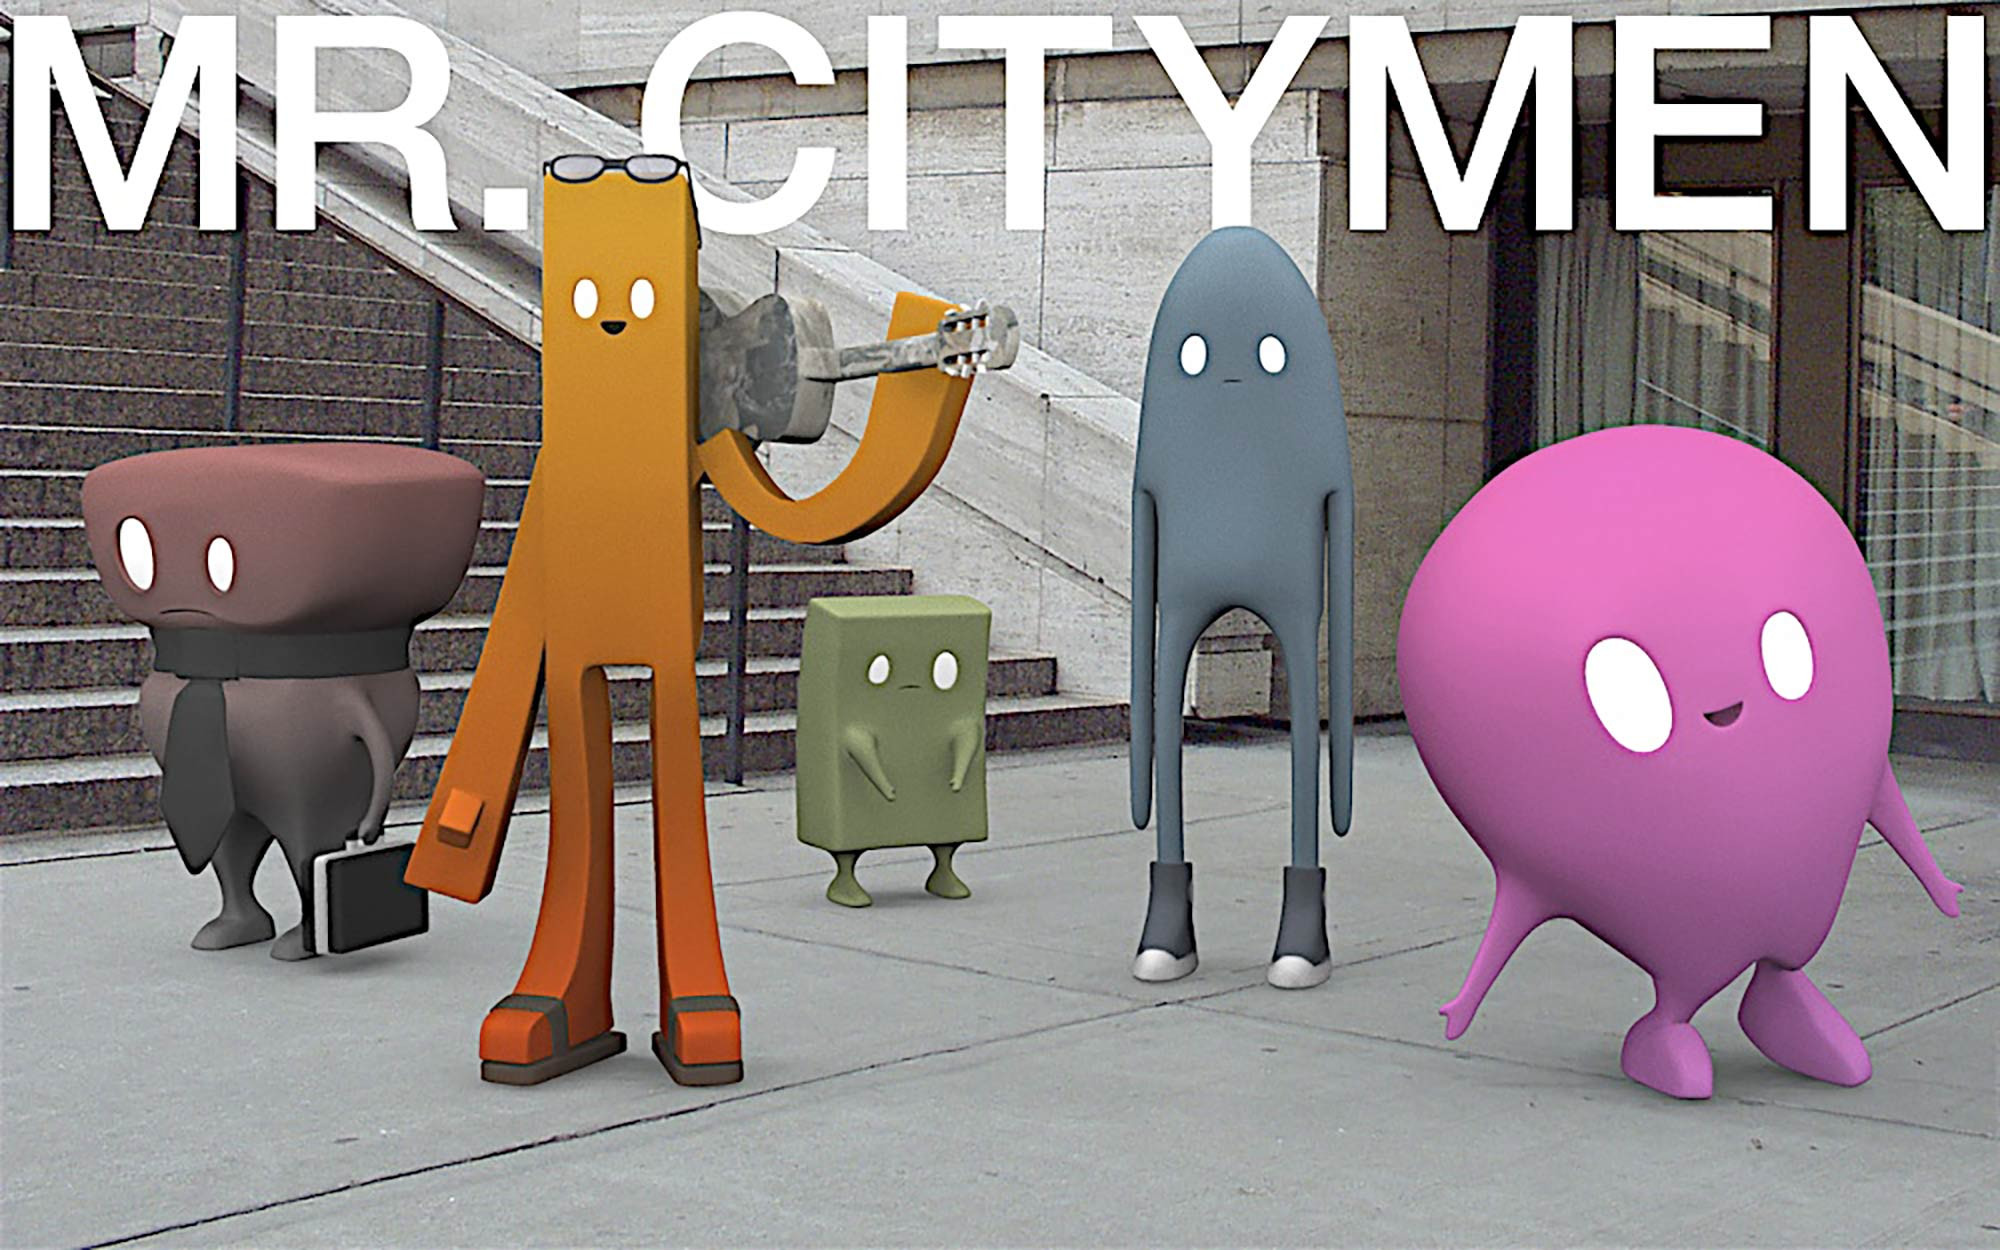 mr_citymen_01